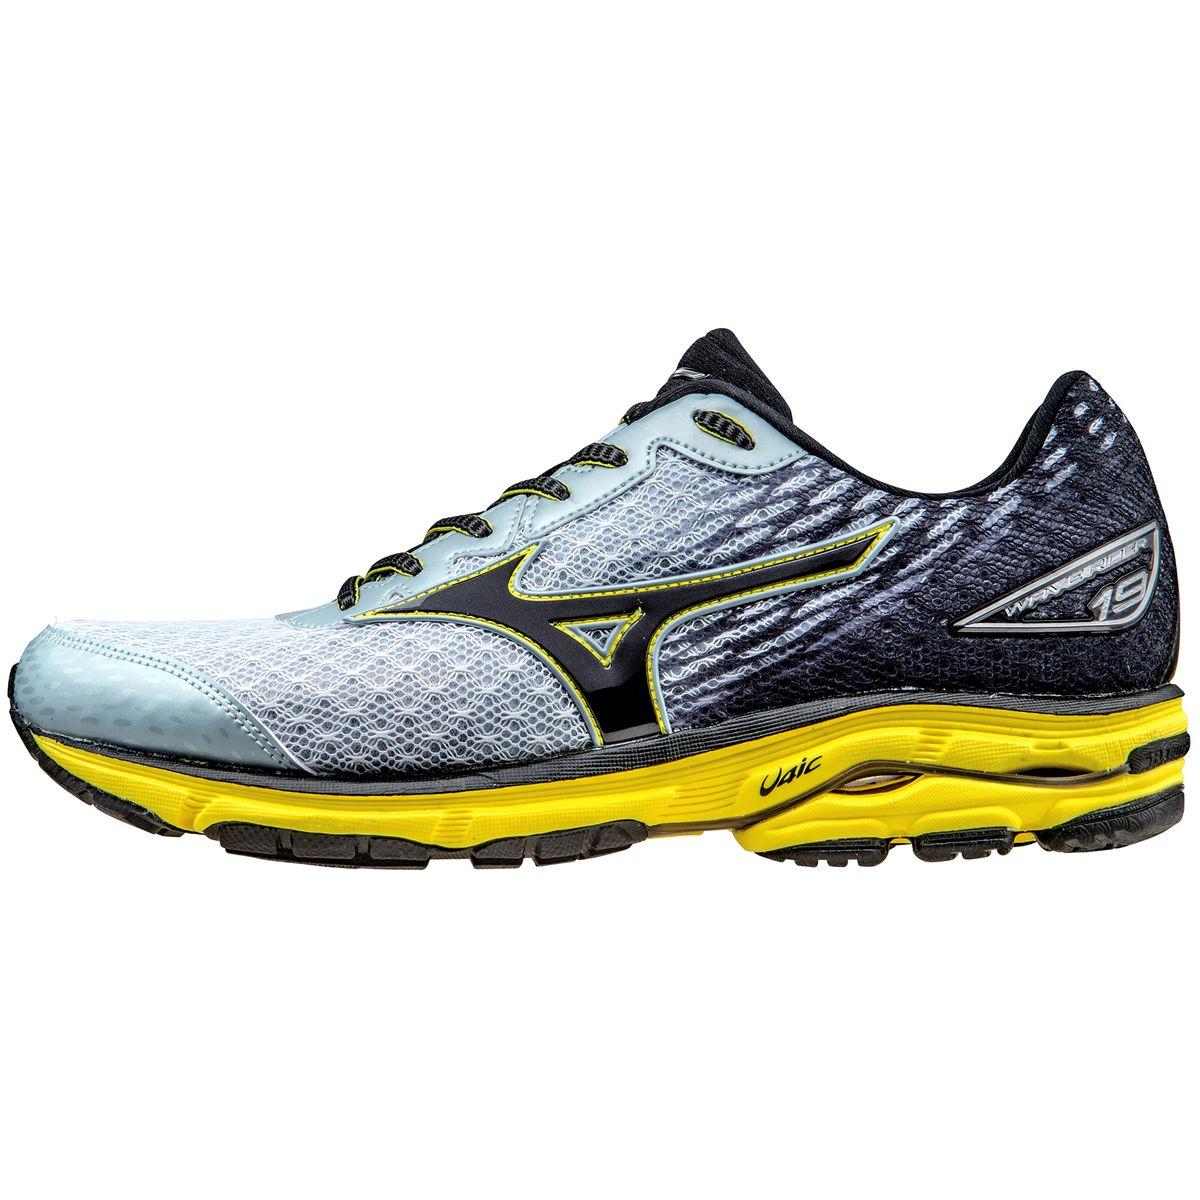 Clean Mizuno Running Shoes